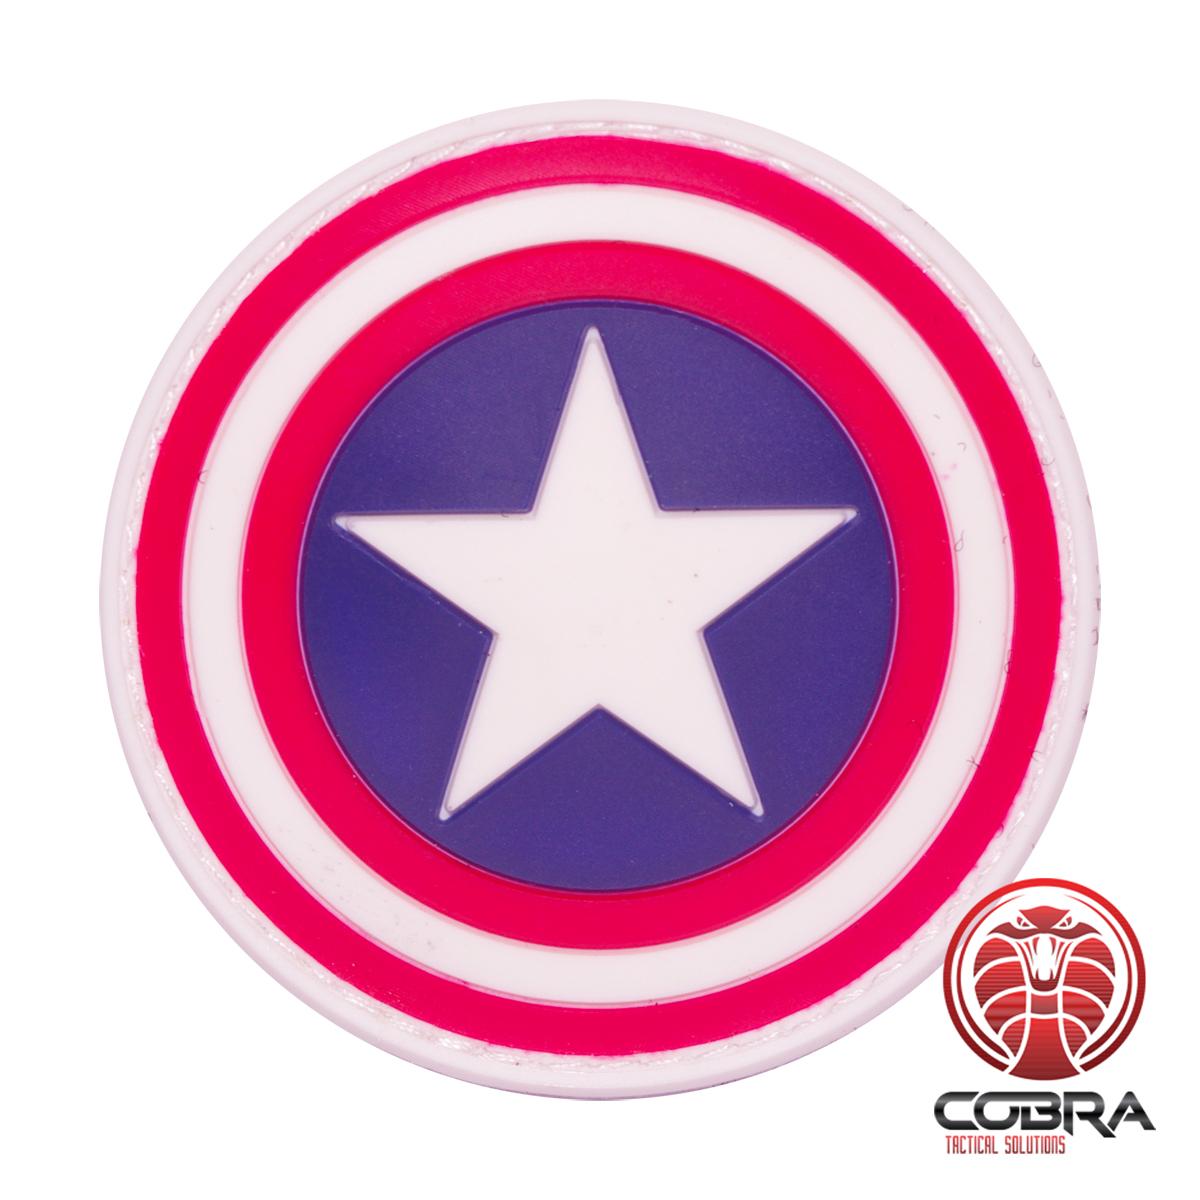 Captain America shield Avengers movie cosplay PVC patch   velcro ...